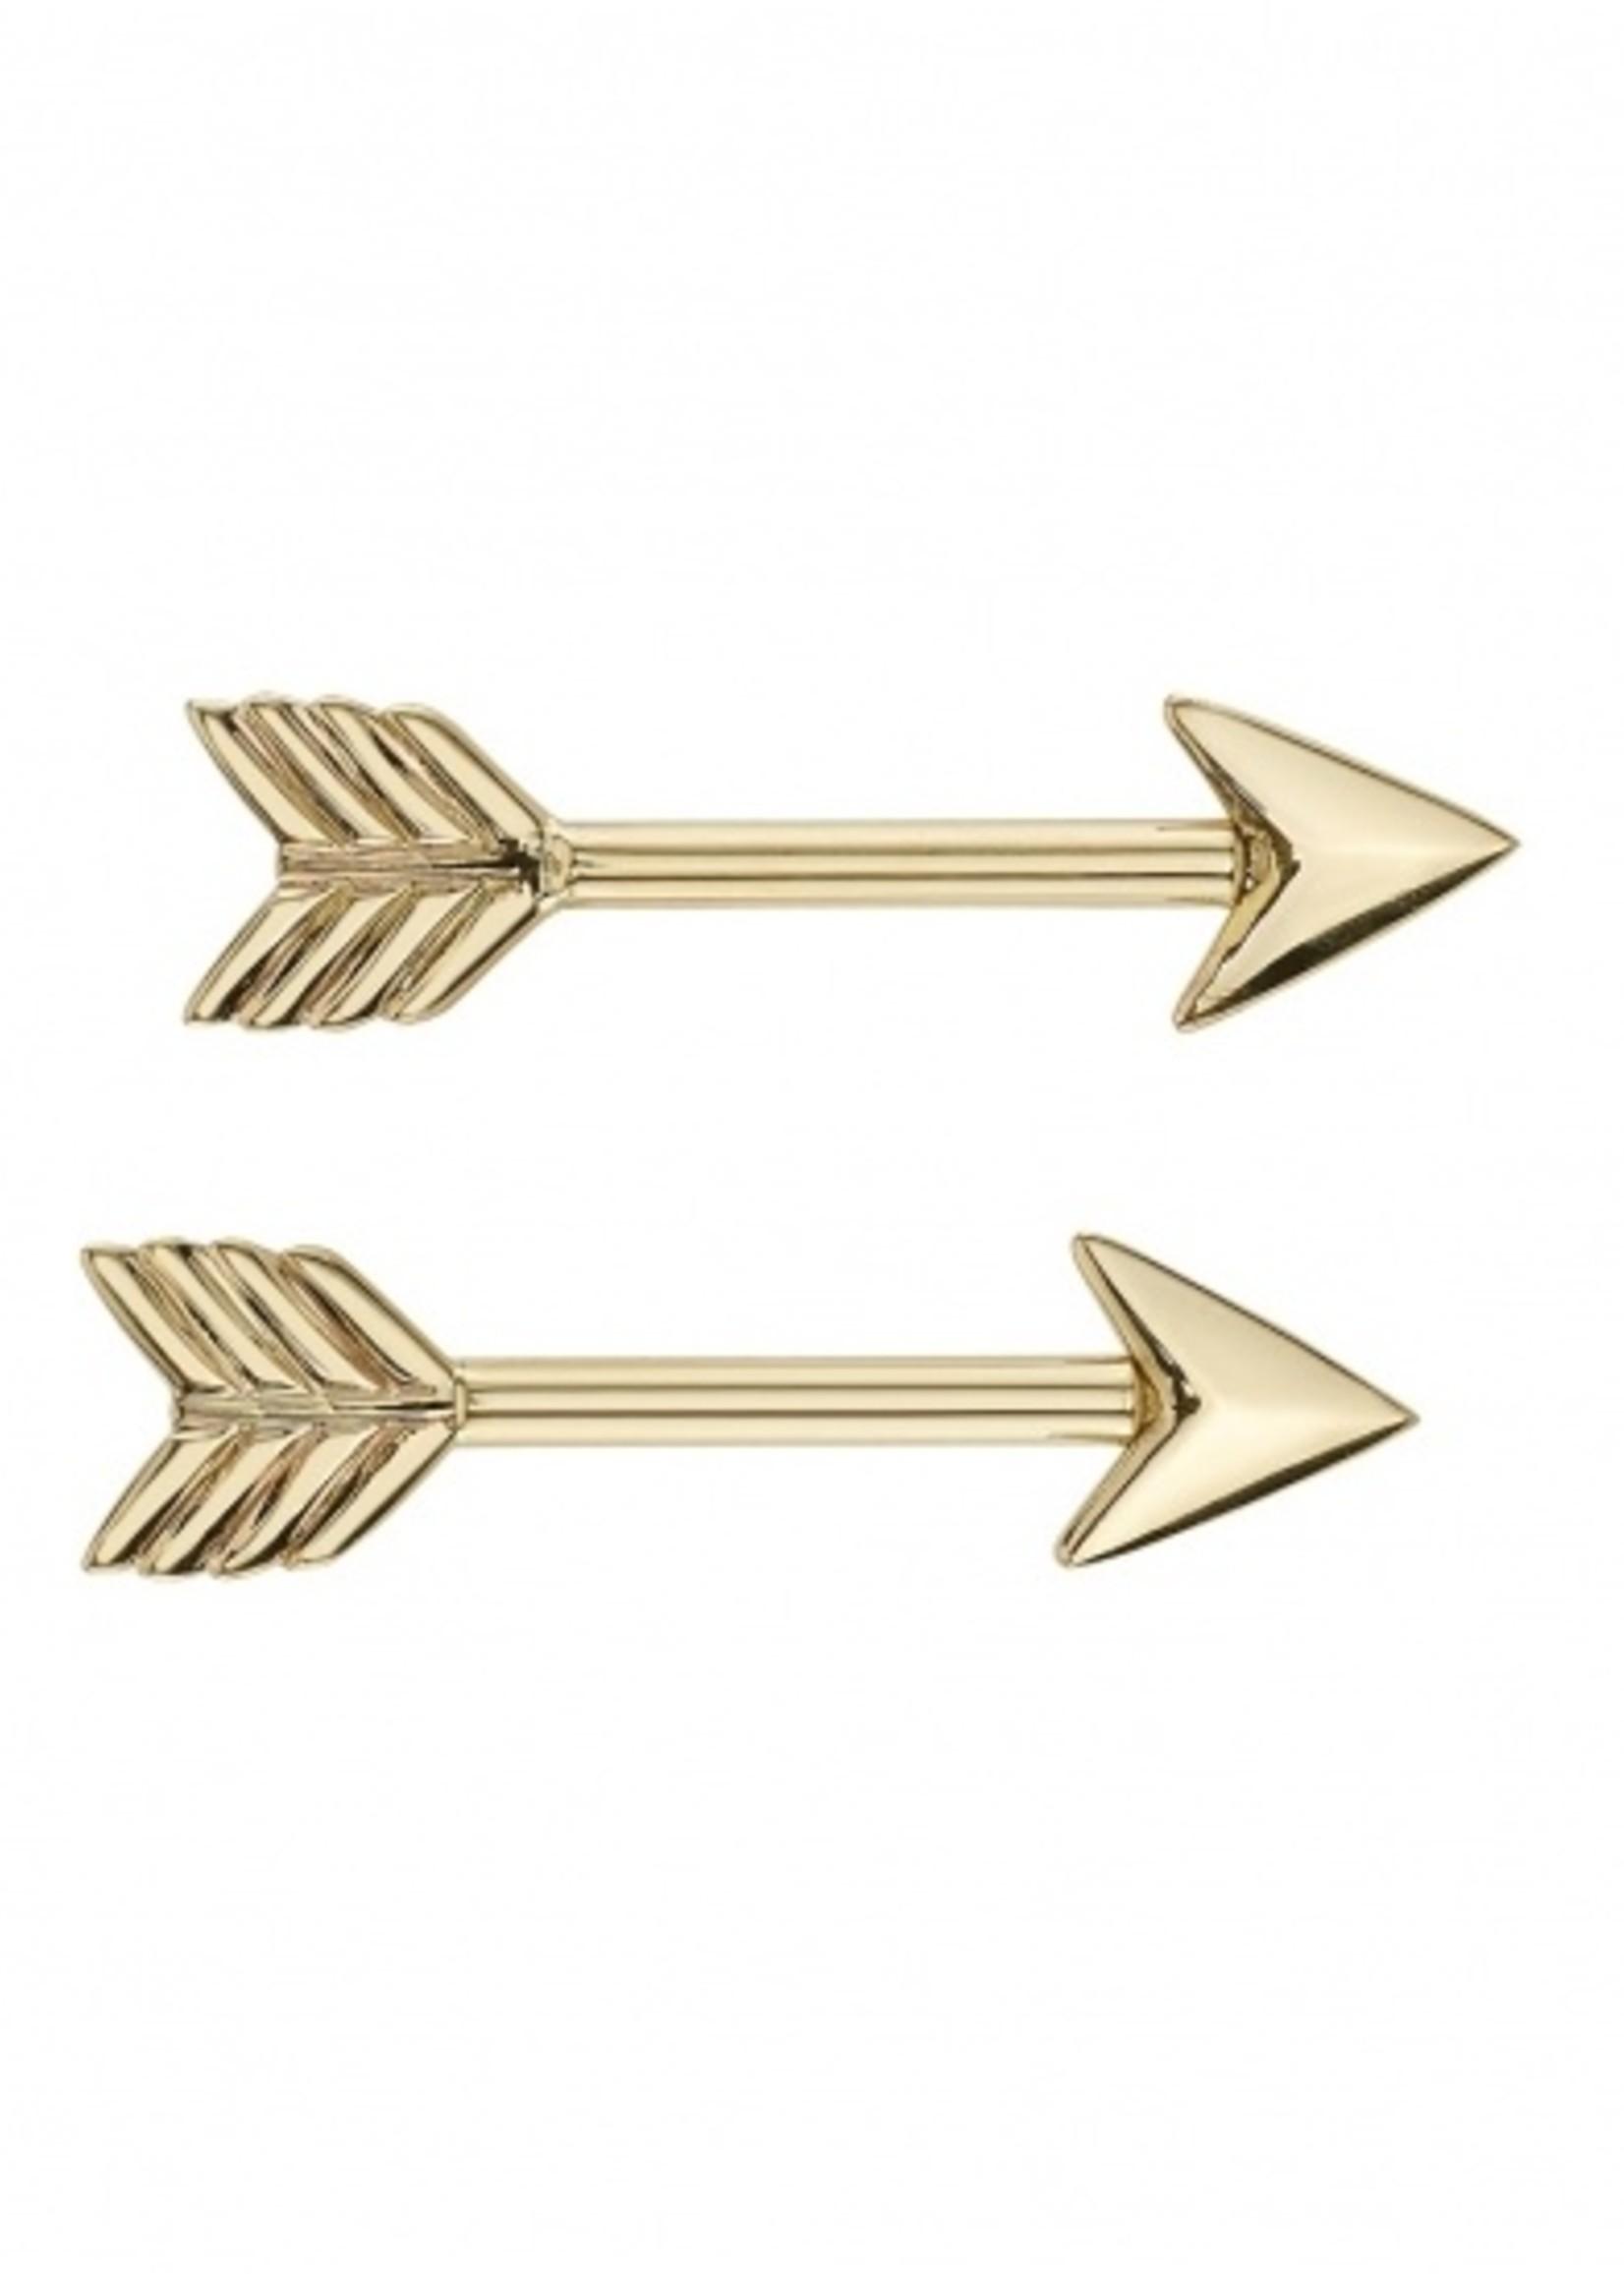 14k 14g Gold Arrow Threaded Ends (SET of 2)